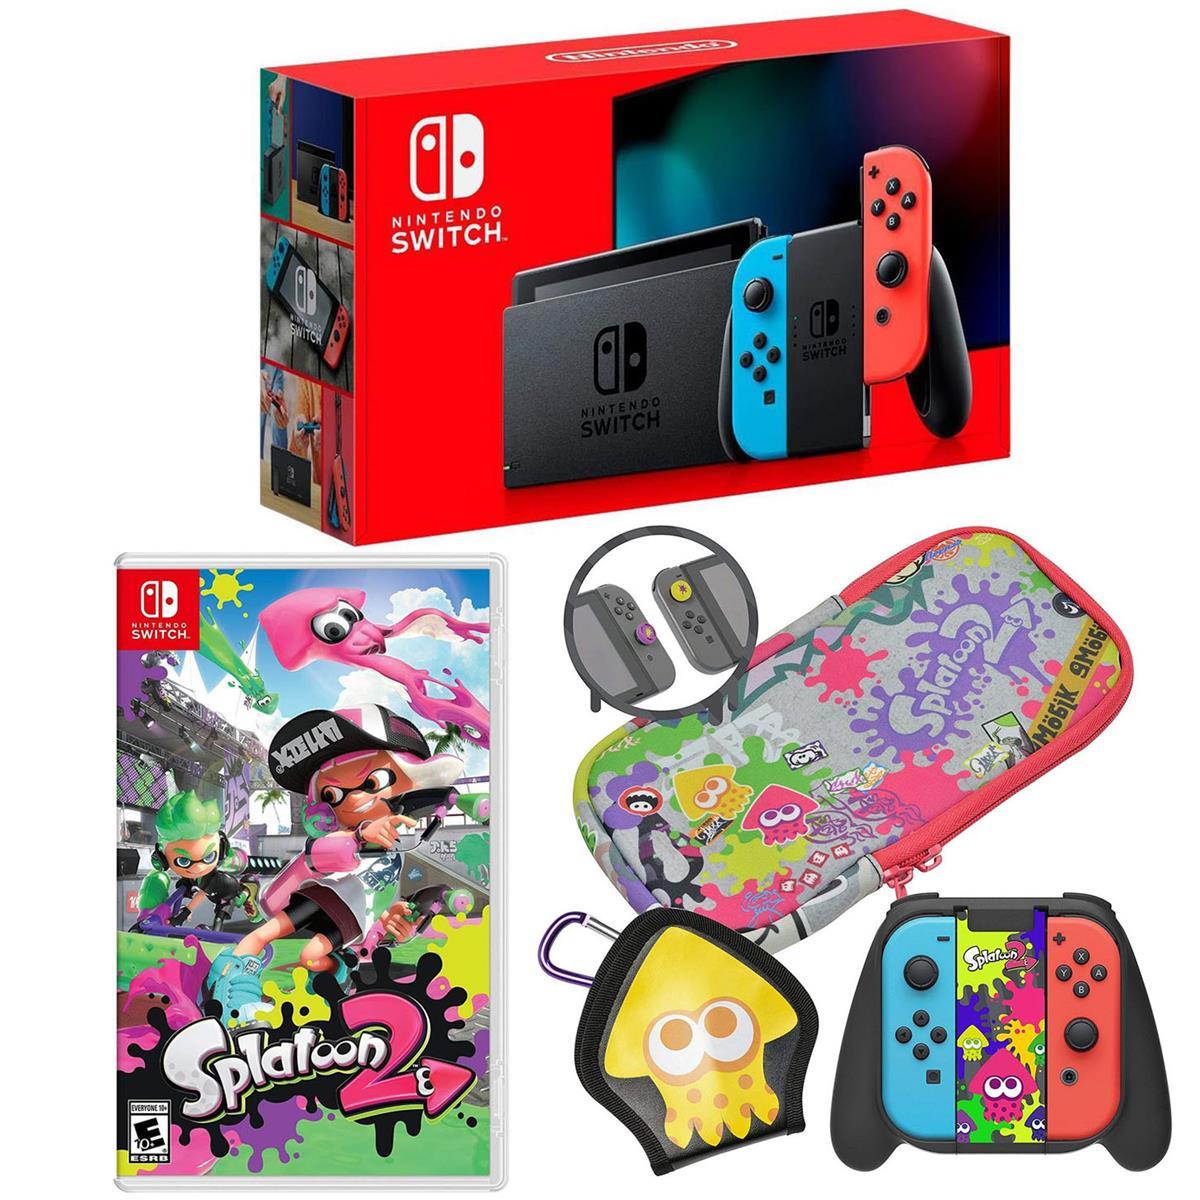 Nintendo 32GB Nintendo Switch with Neon Blue & Neon Red Joy-Con Controllers - Bundle With Nintendo Splatoon 2 for Nintendo Switch, Hori Splatoon 2 Deluxe Splat Pack for Nintendo Switch